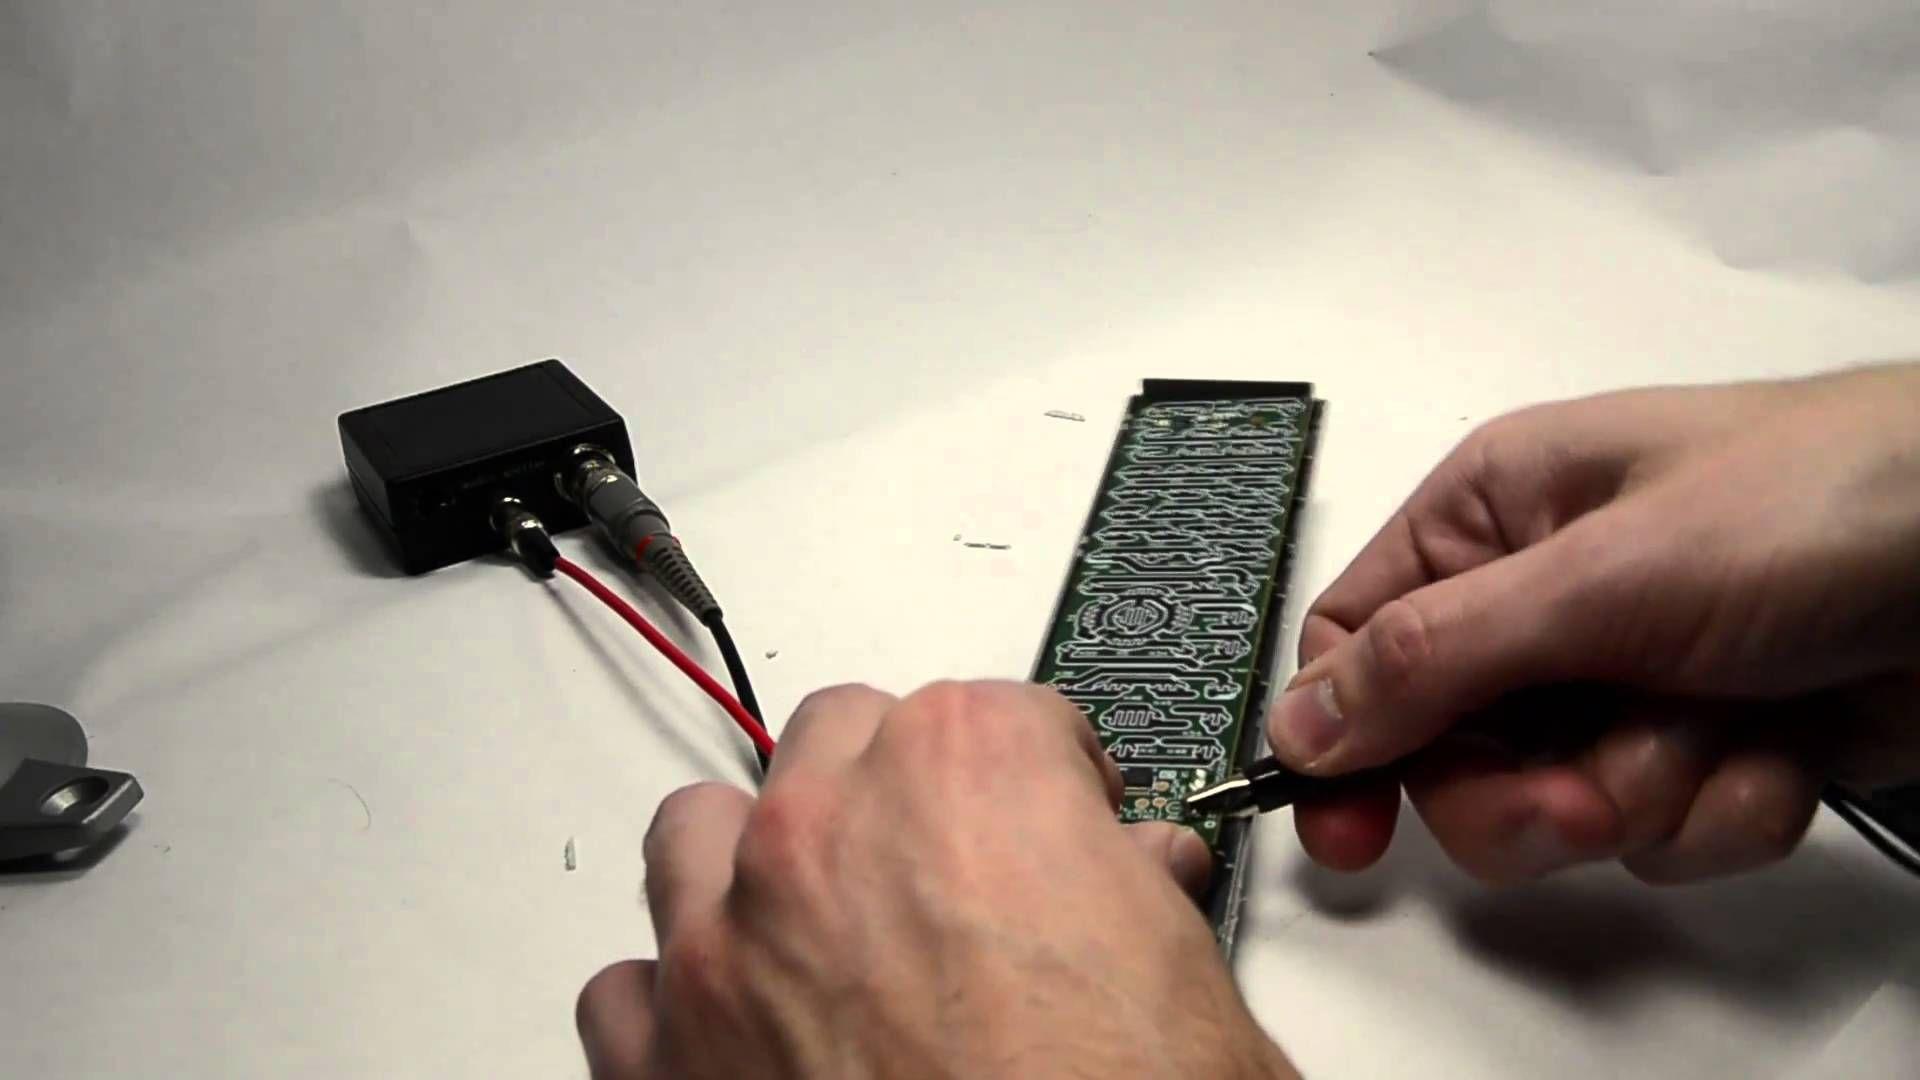 Pin By Chris Herrmann On Ardunoise Pinterest Audio Wood Pecker Sound Generator Circuit Diagram Image